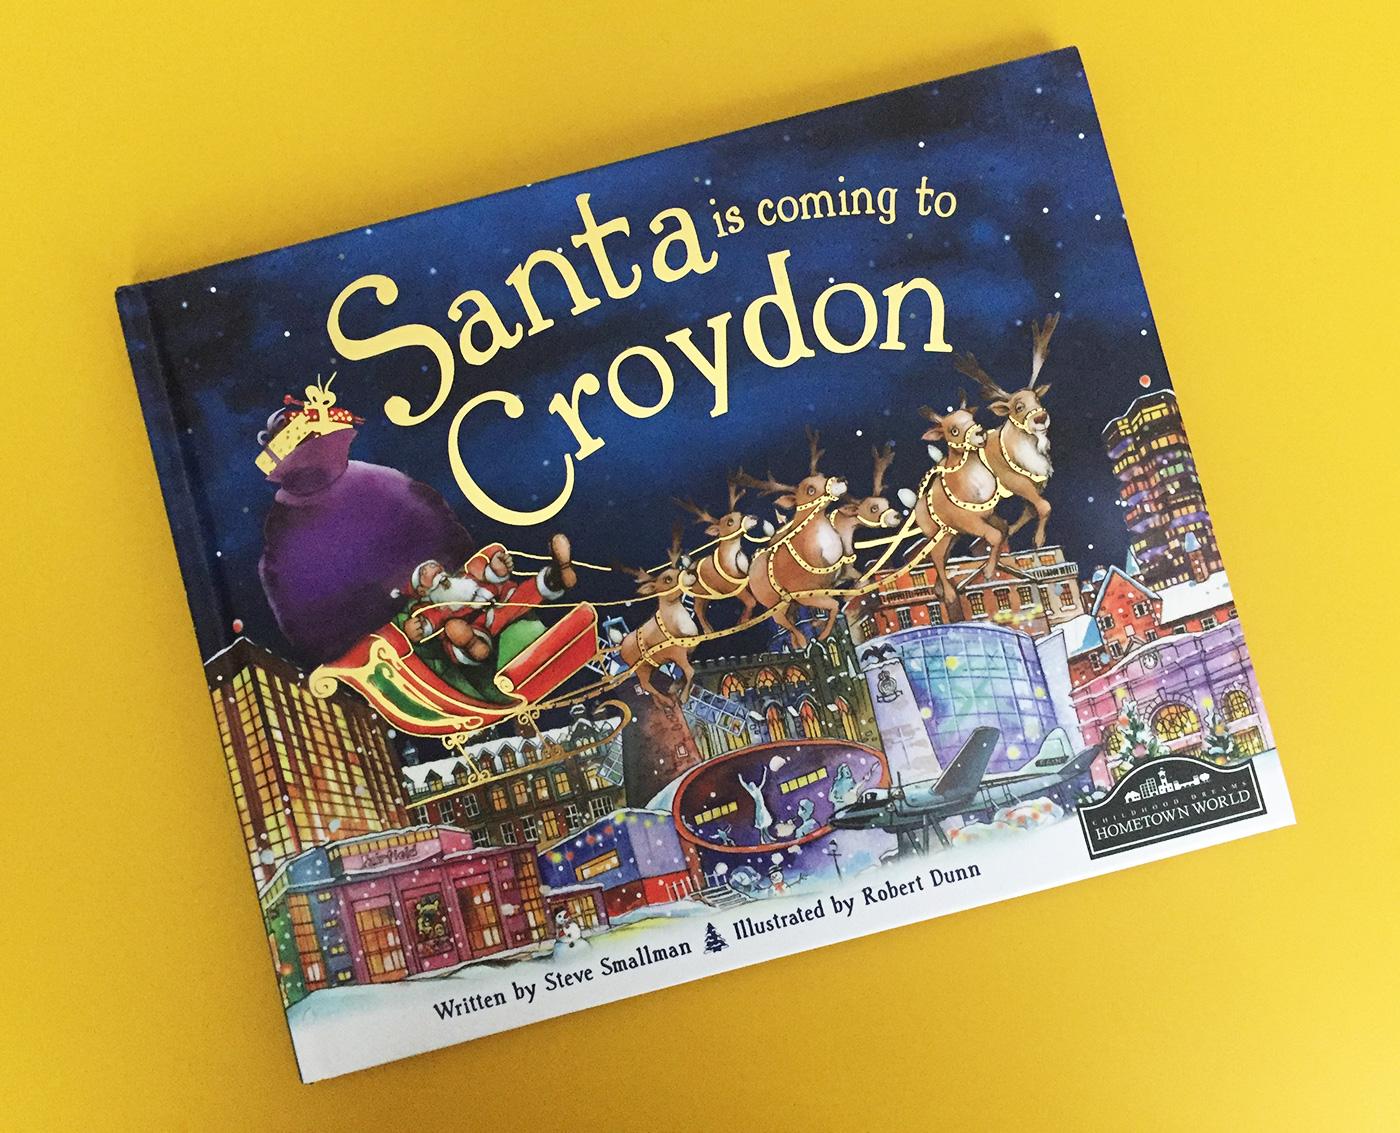 Santa is Coming to Croydon by Steve Smallman